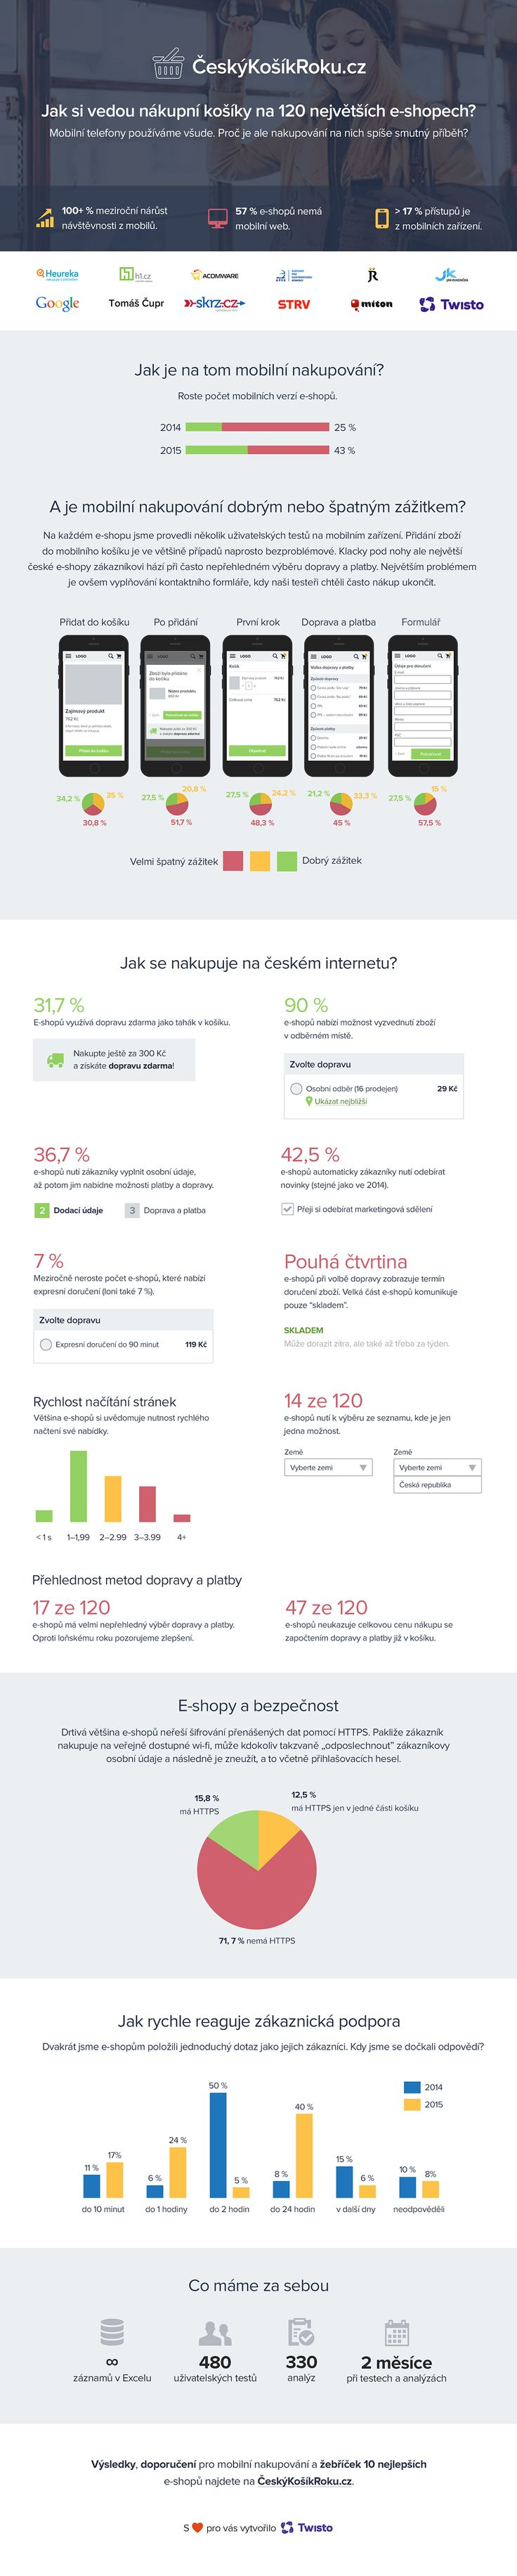 Czech e-commerce 2015 (compare with 2014)